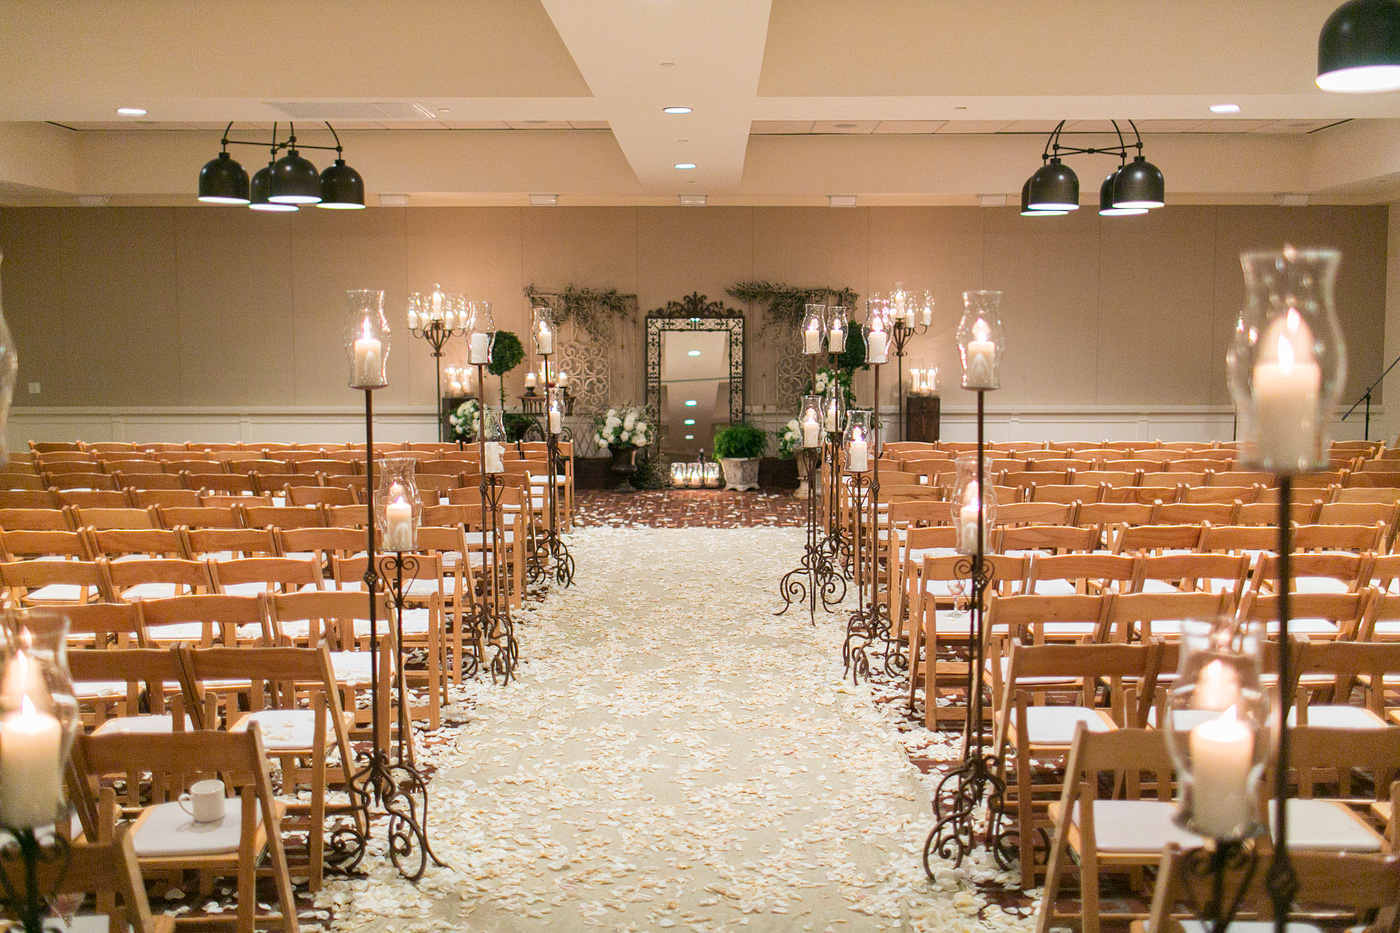 Estancia-La-Jolla-Wedding-31